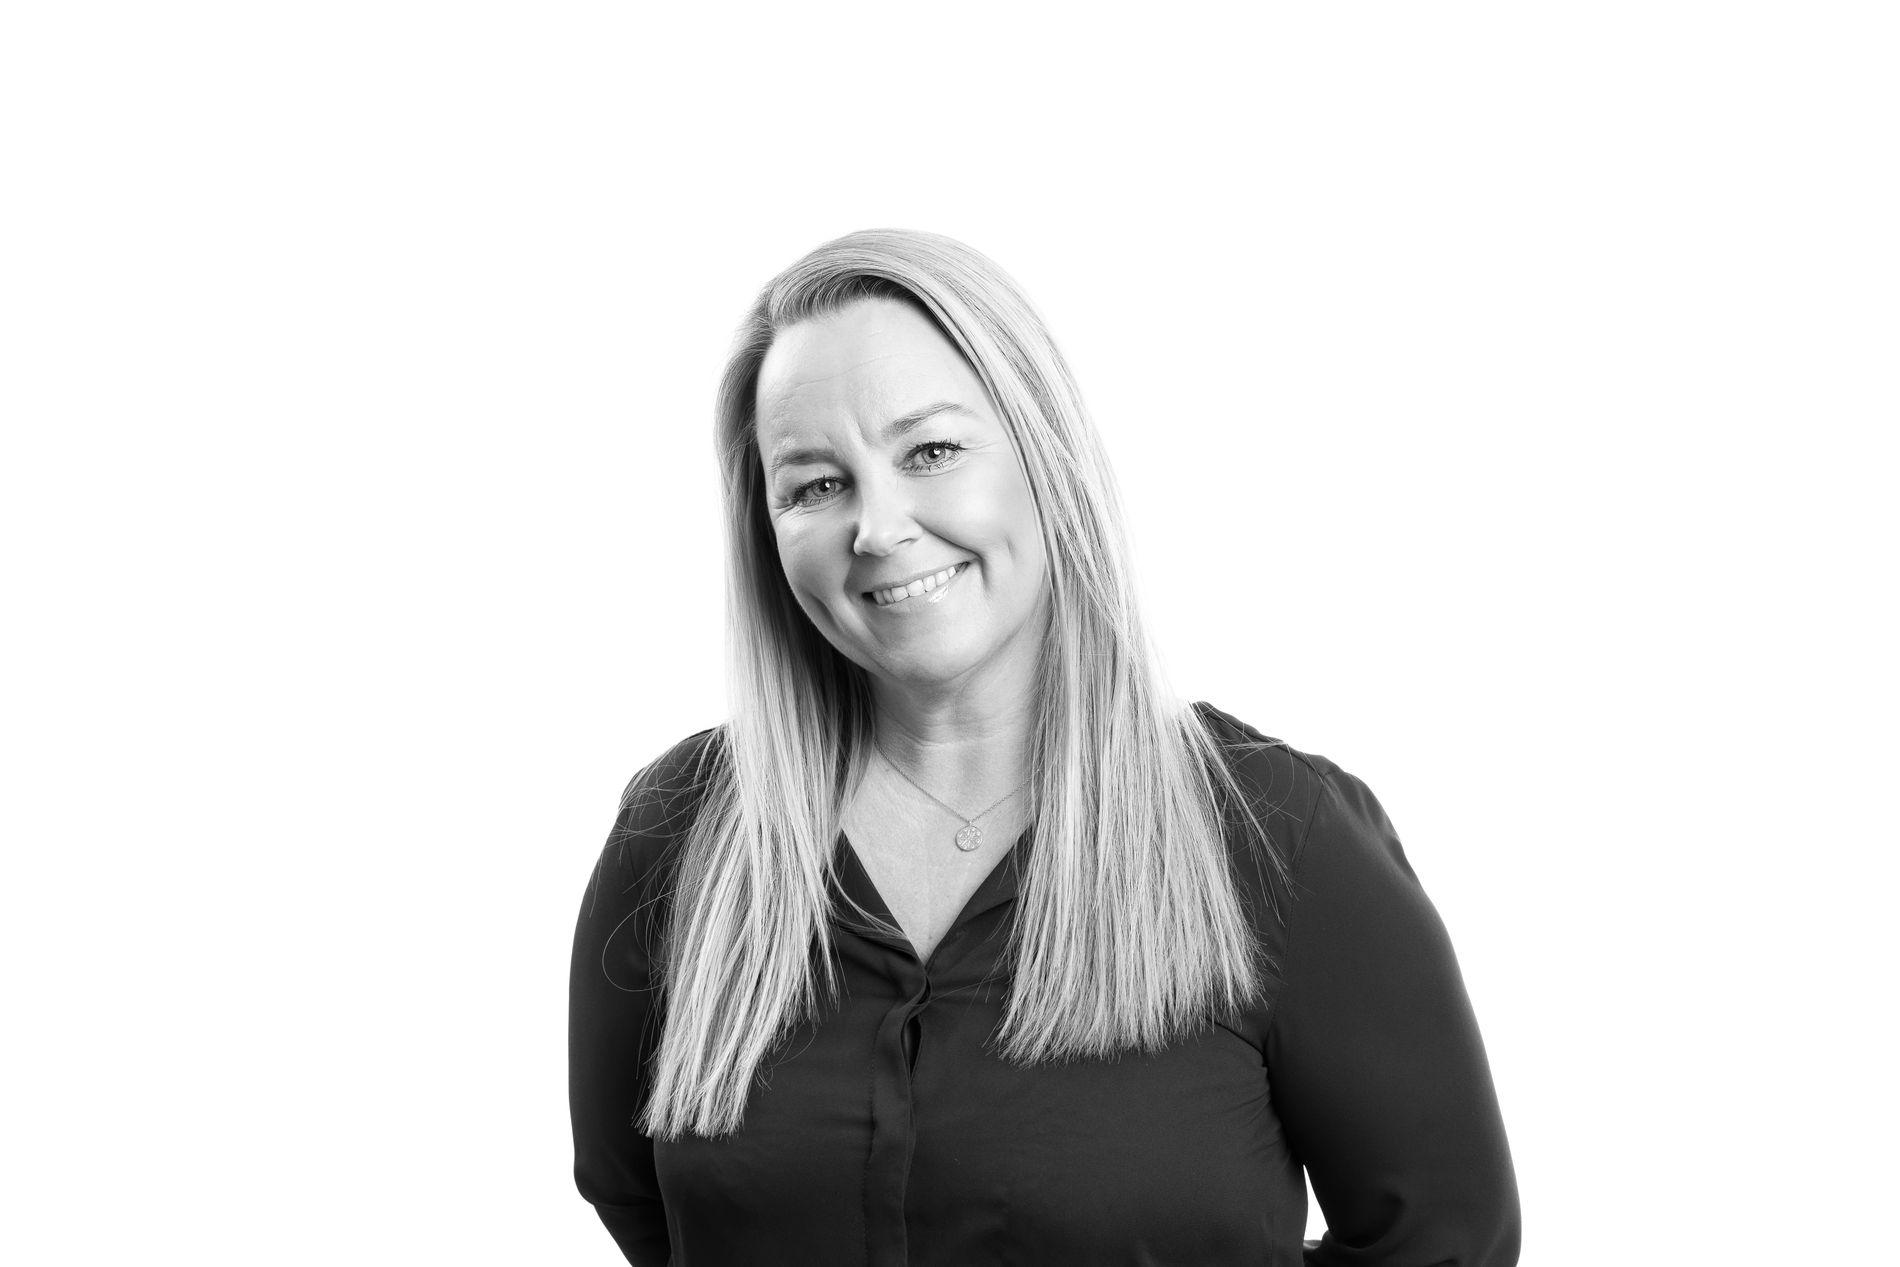 Monica Igland, deputy director of the bank.